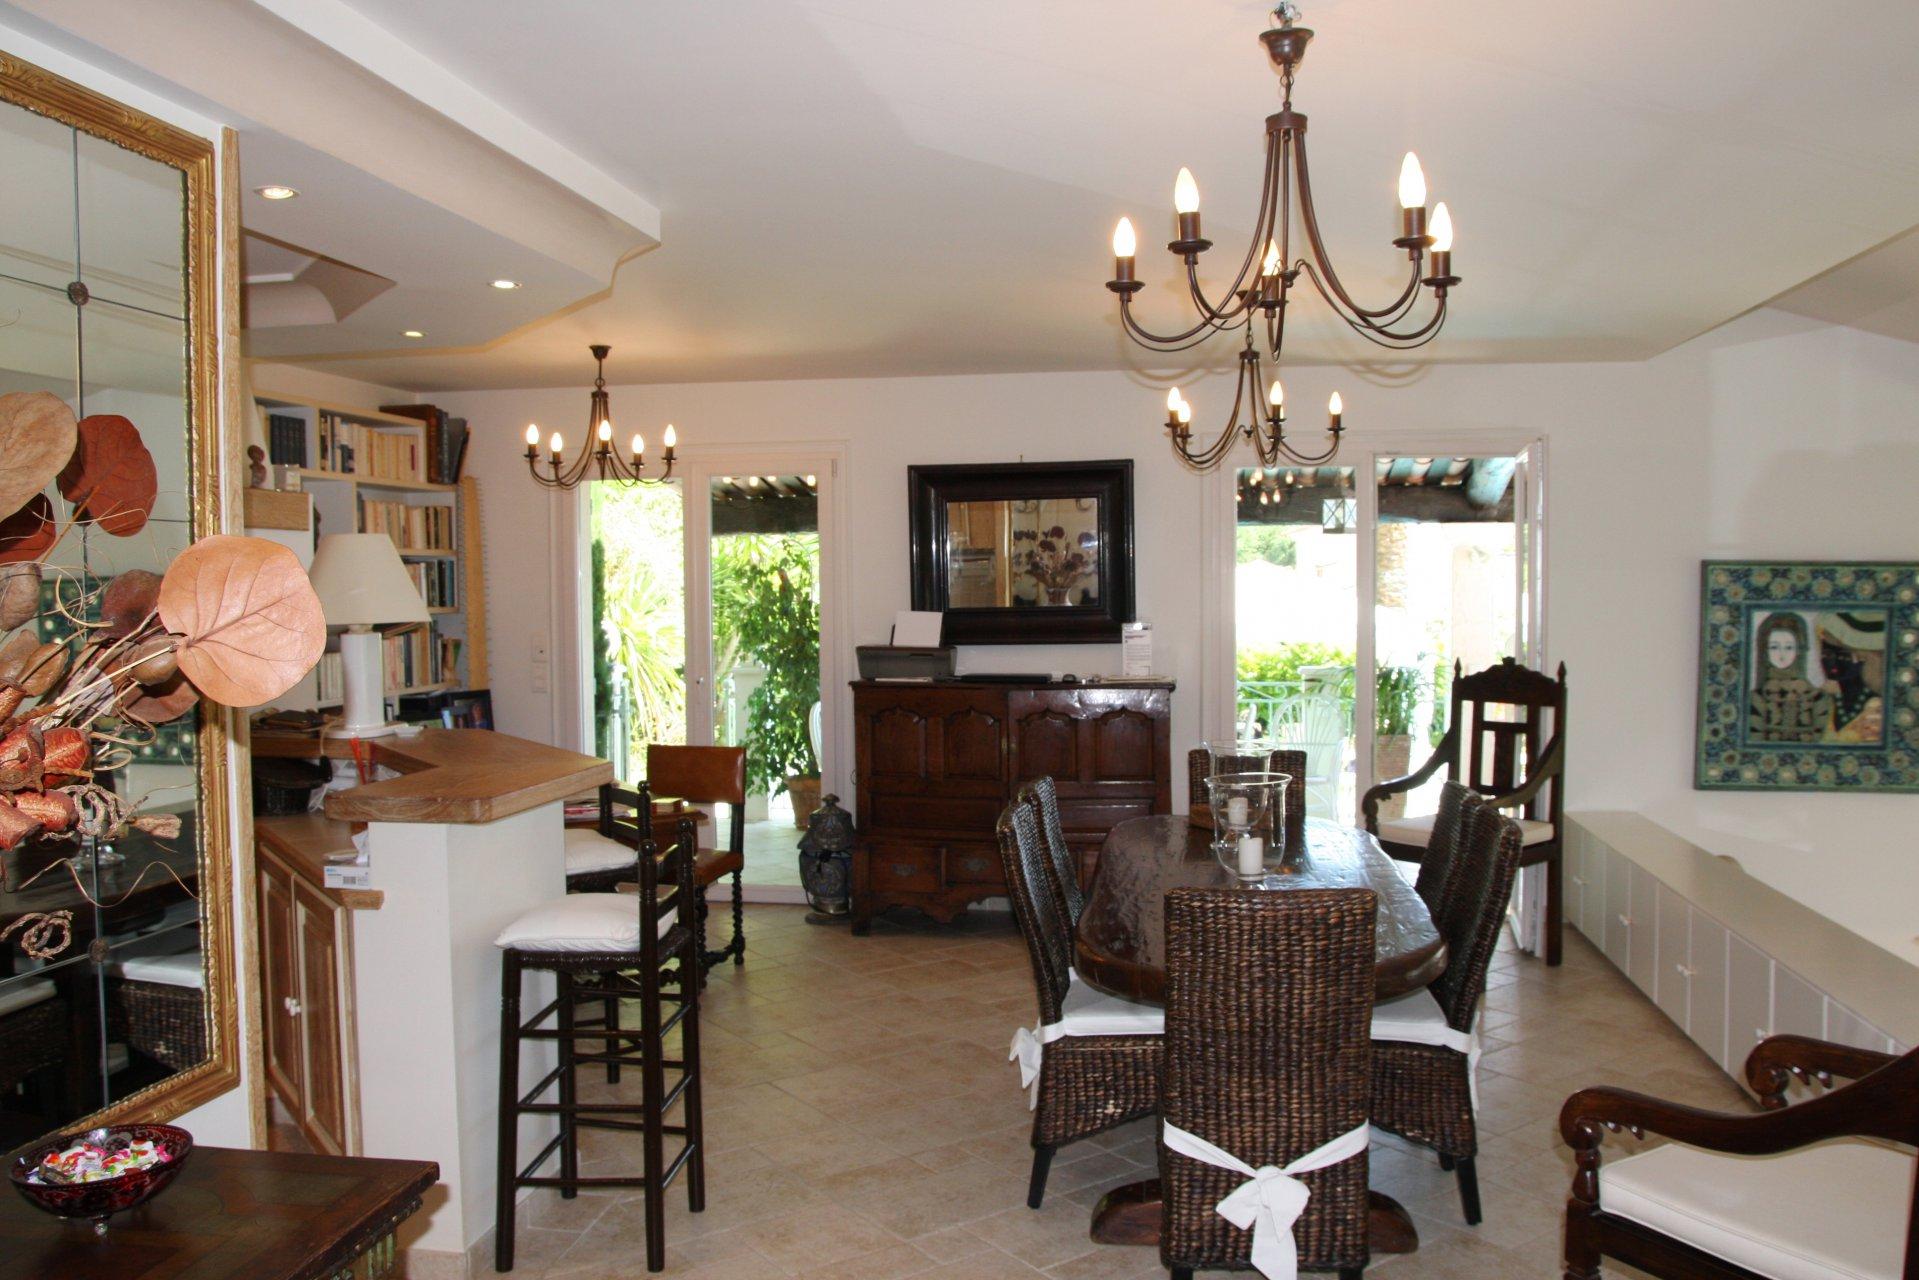 Chandelier, natural light, kitchen bar